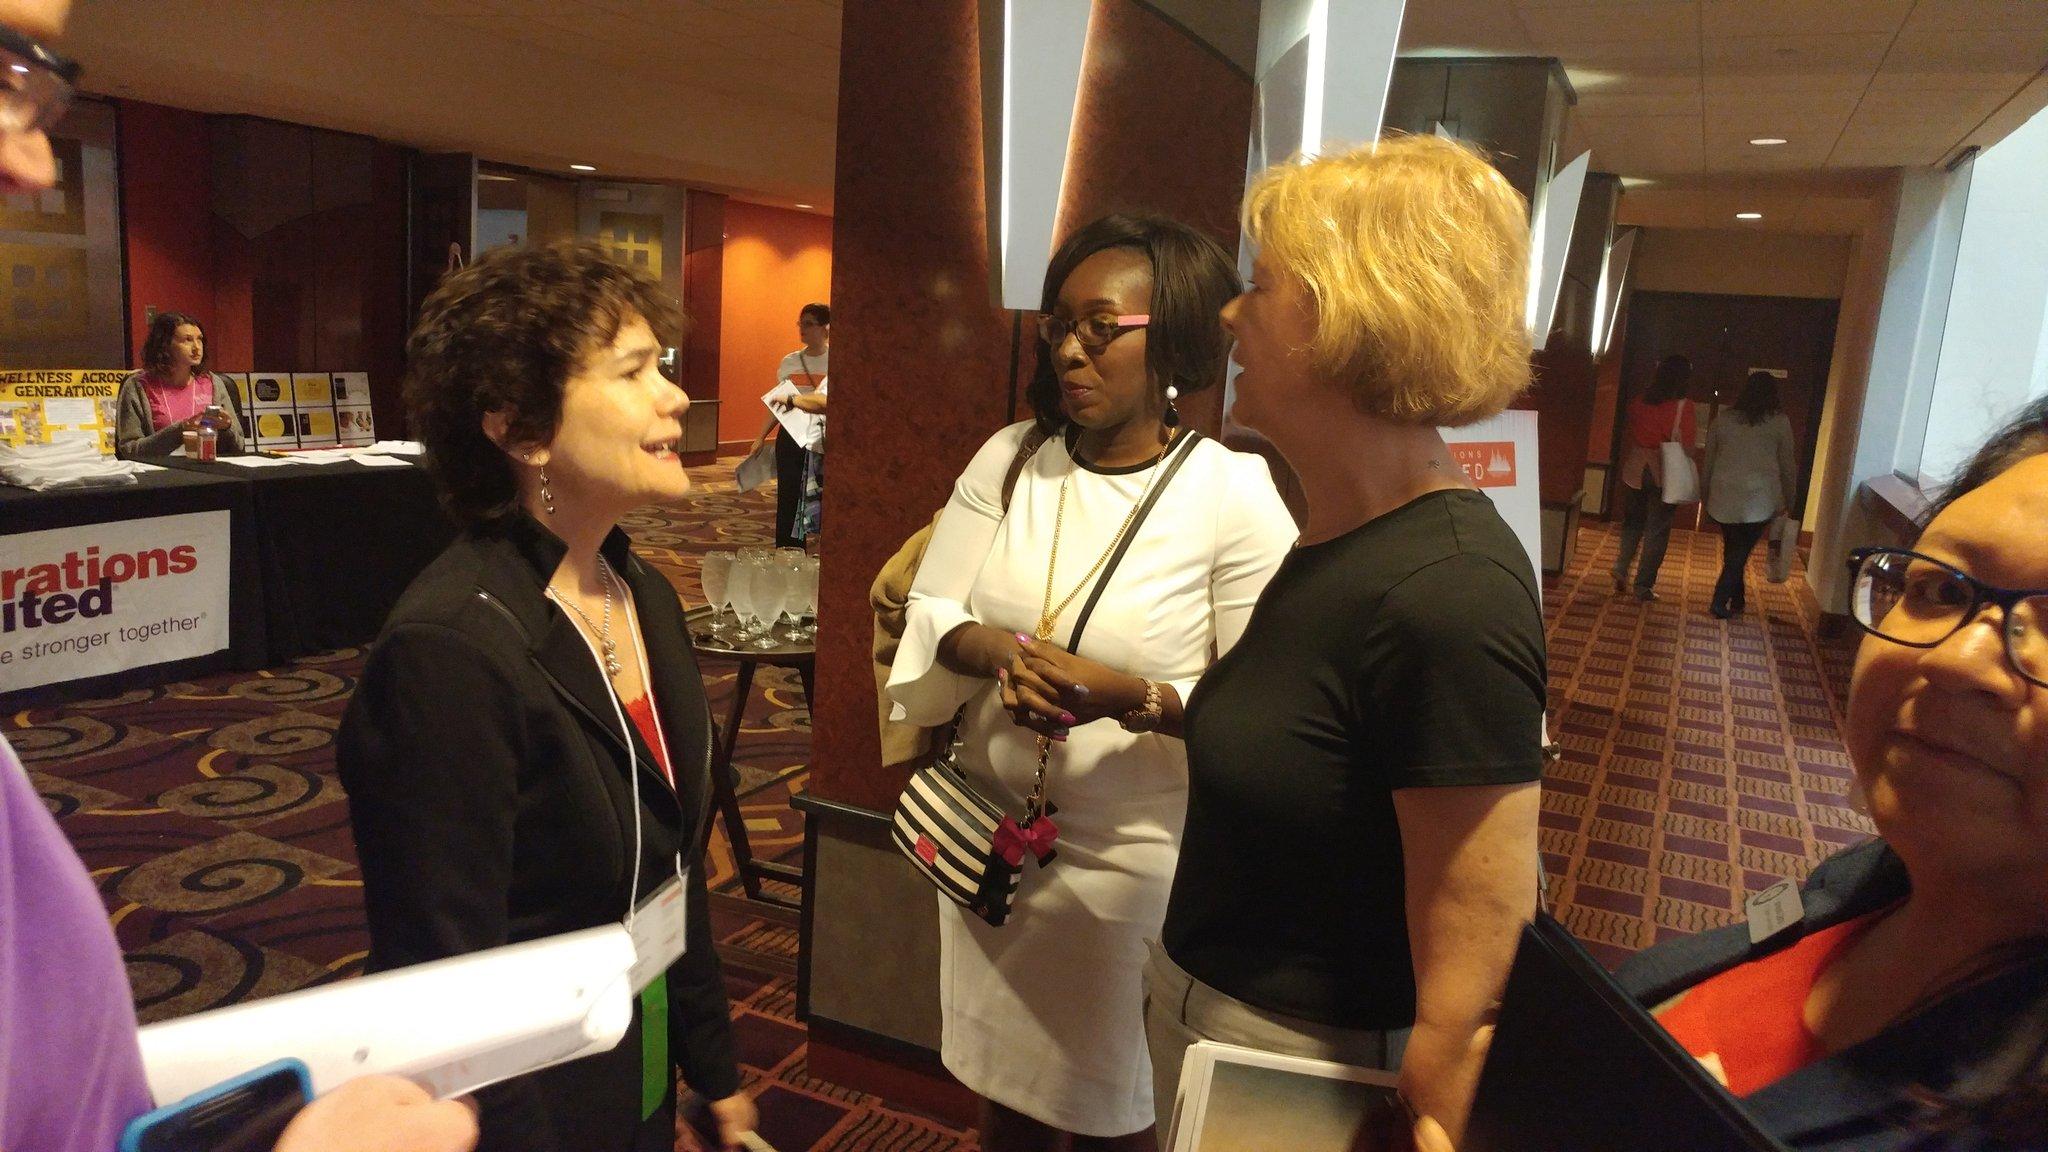 Donna greets @SenatorBaldwin. #Gensunited17 #ageamped https://t.co/opsEYipgir